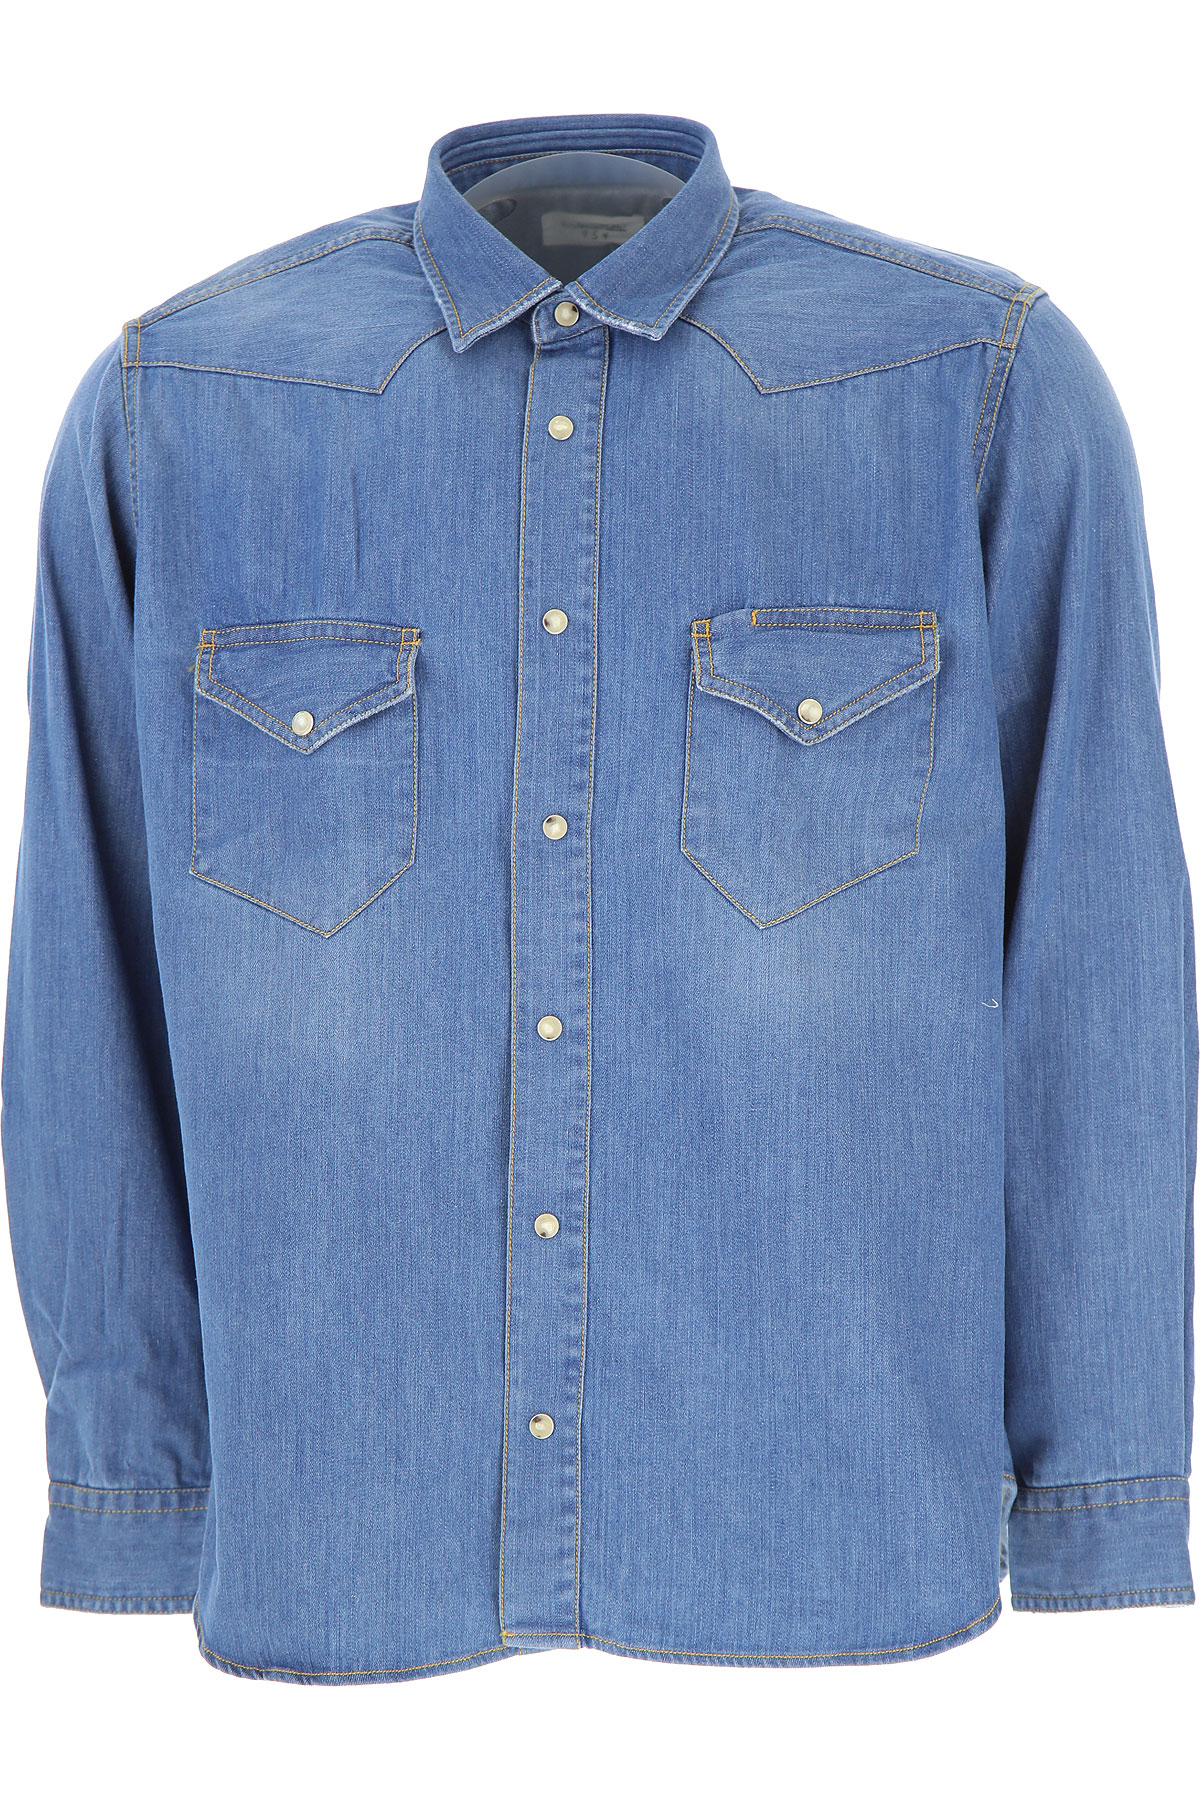 Image of Tintoria Mattei 954 Shirt for Men, Denim, Cotton, 2017, 15.5 15.75 16 16.5 17 17.5